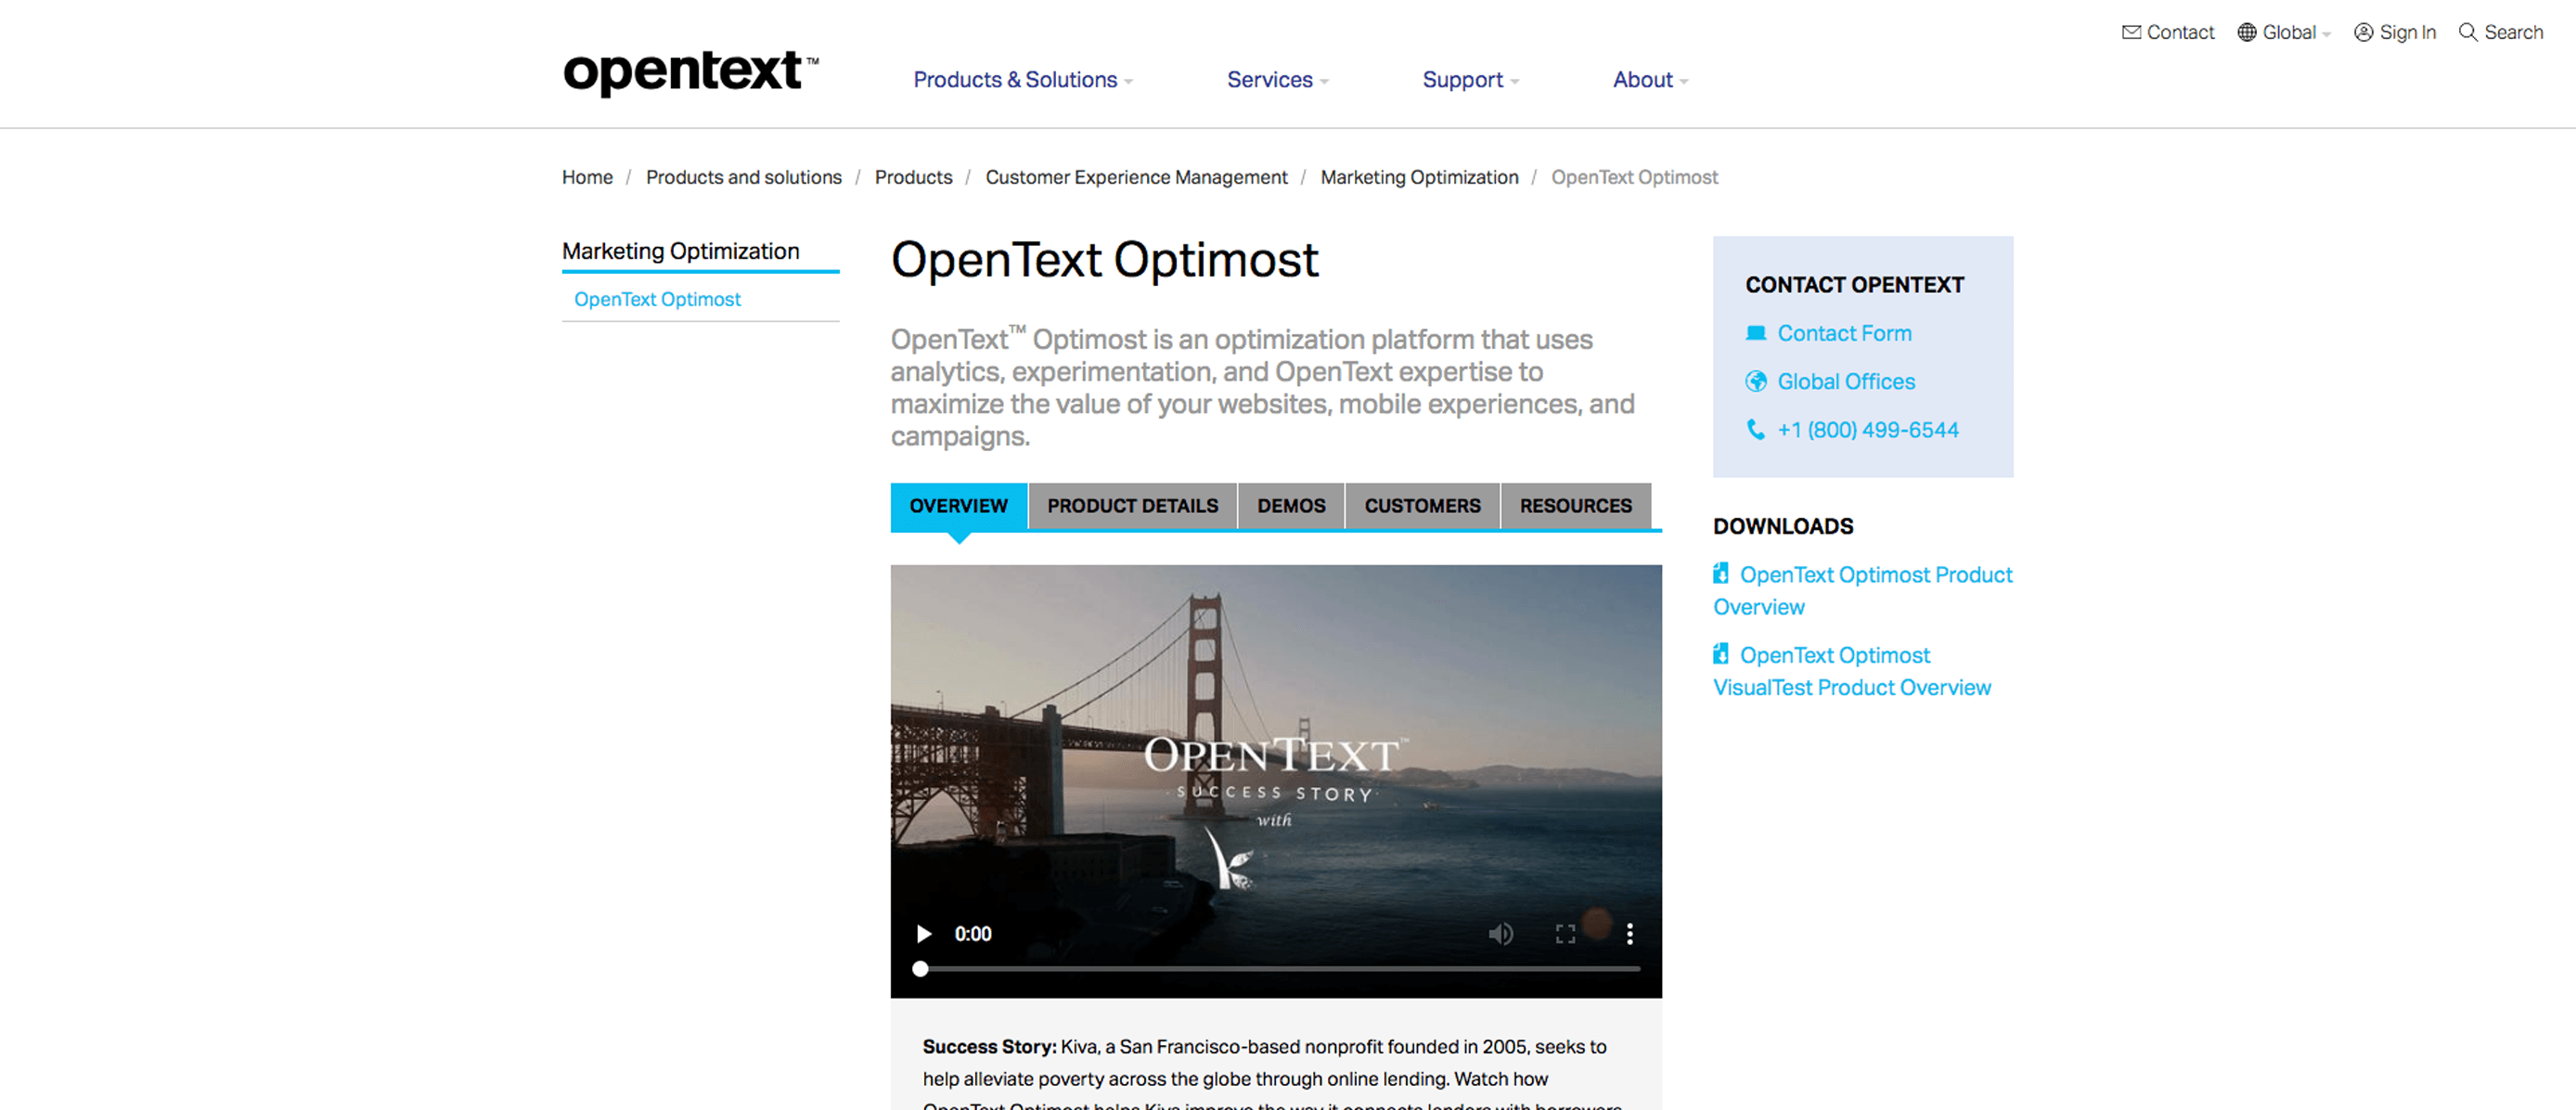 Logiciels de AB Testing - OpenText Optimost